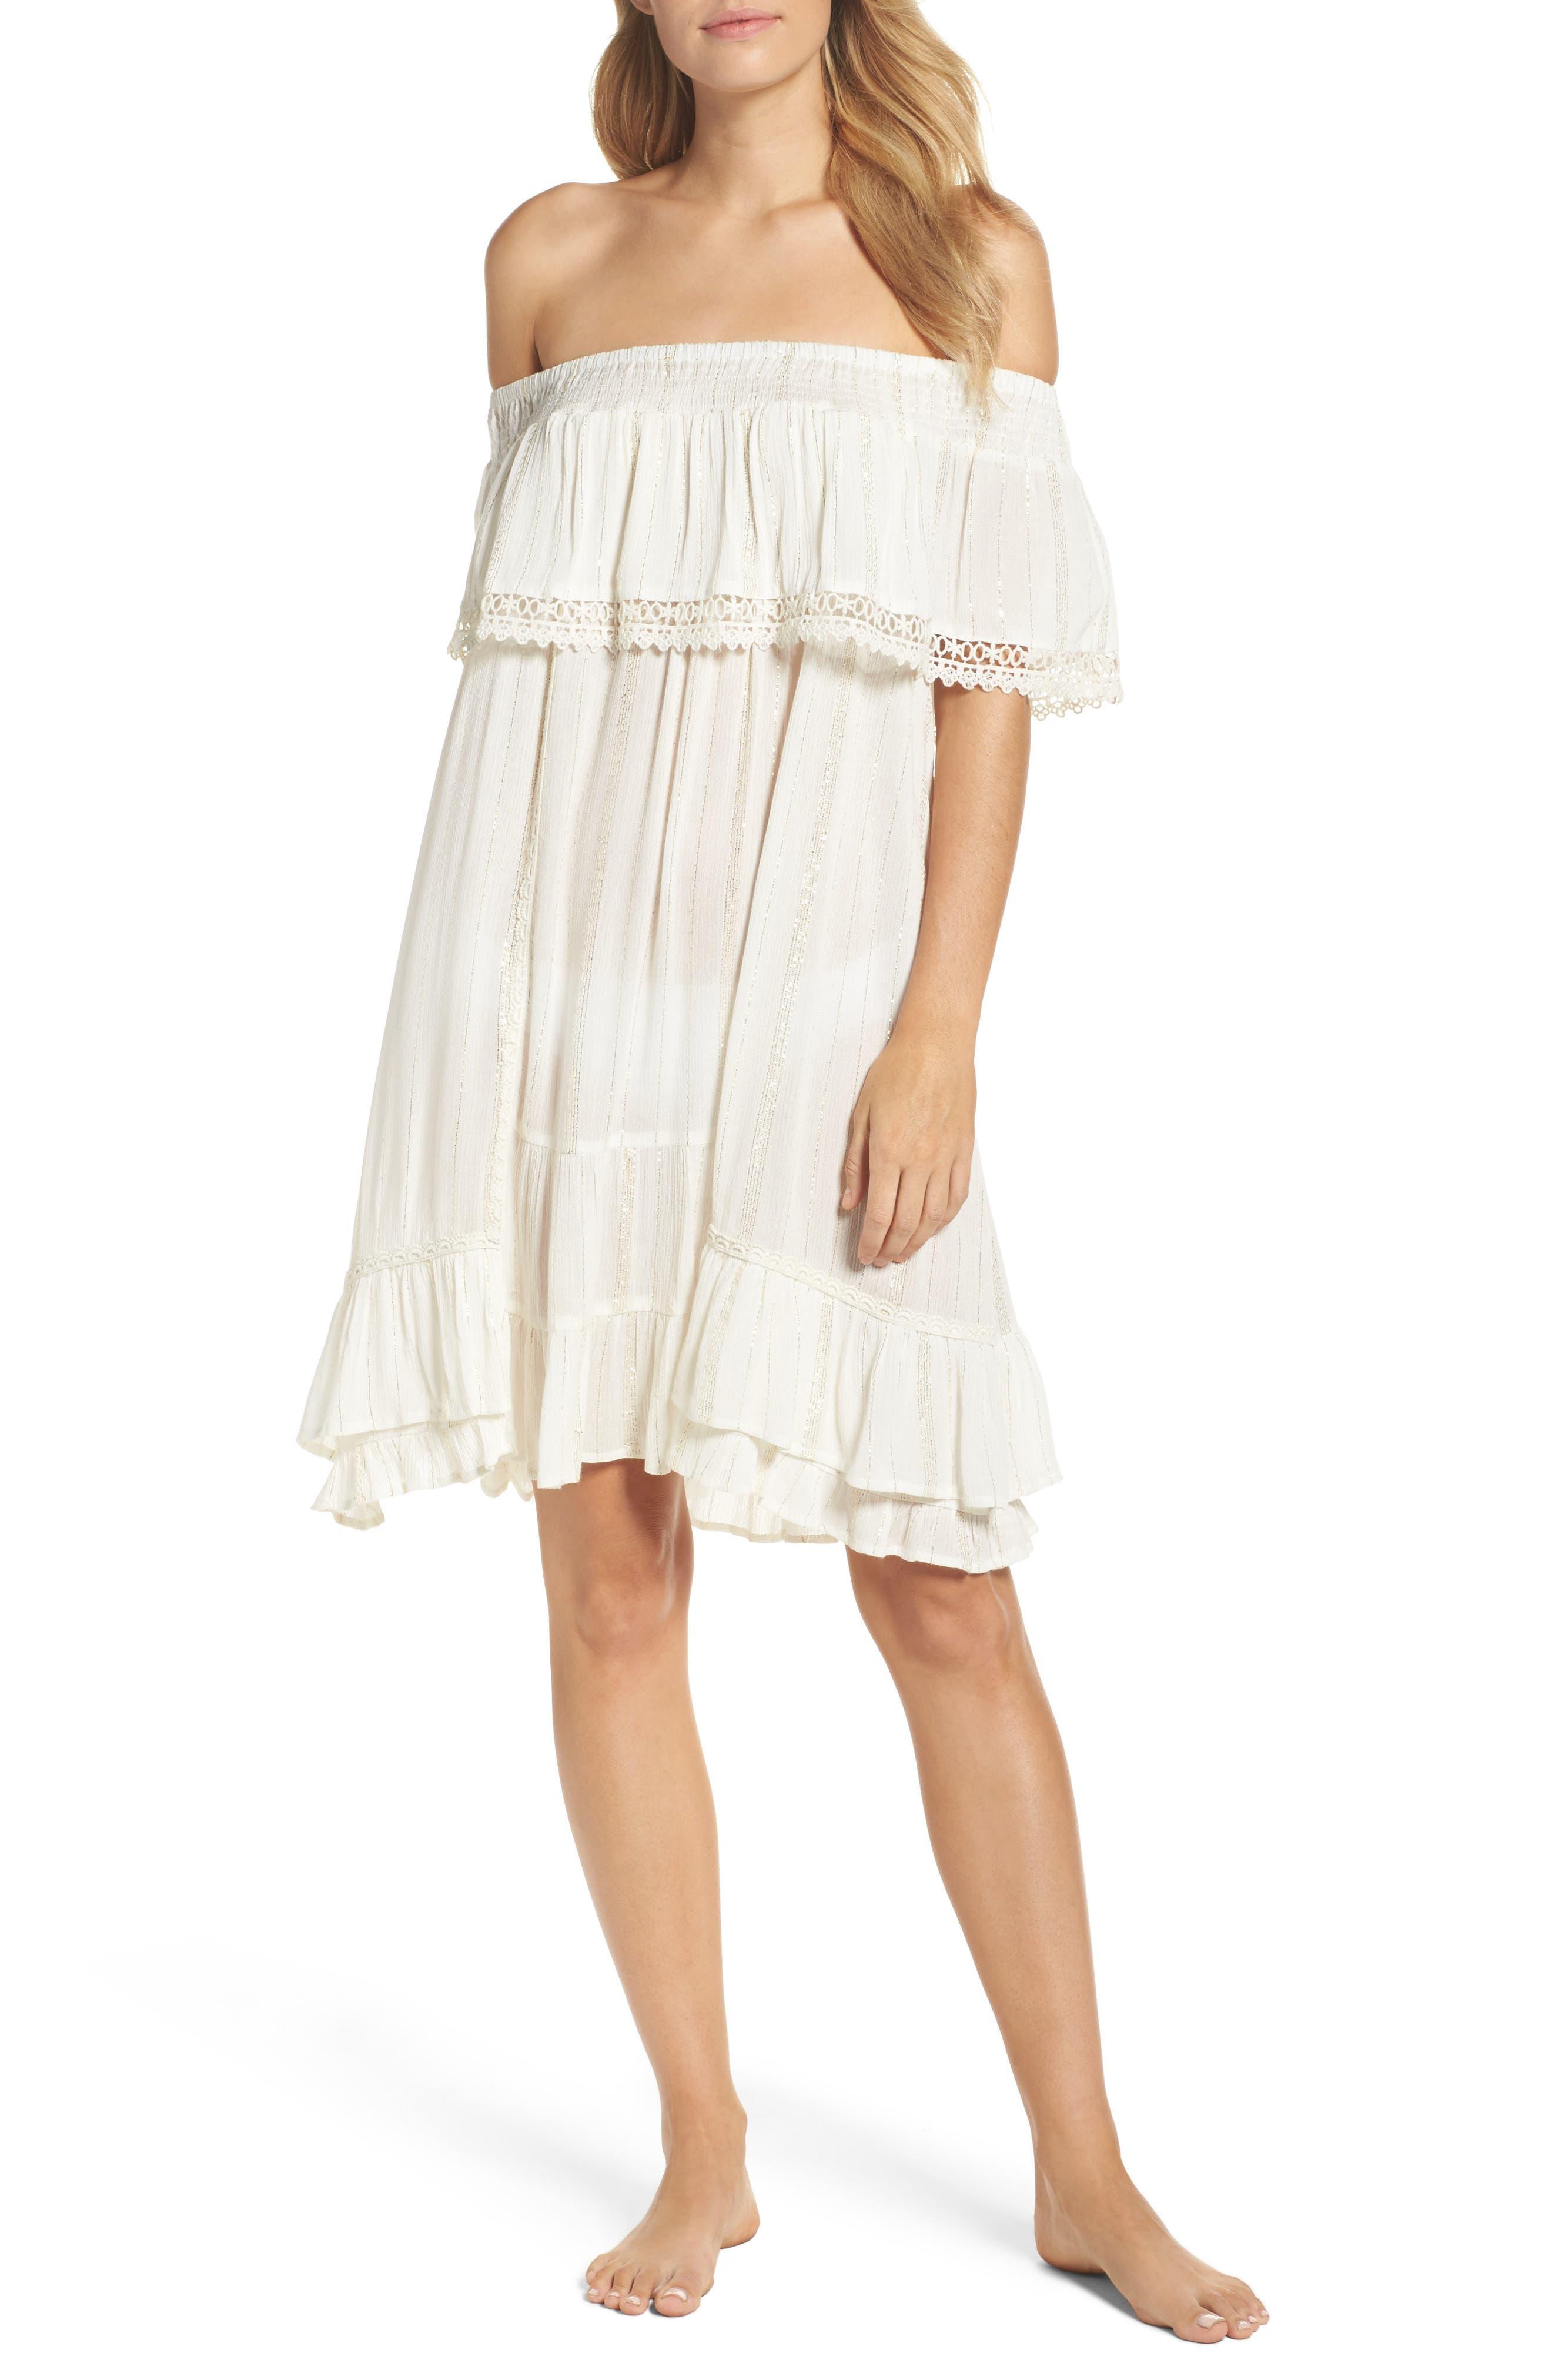 Alternate Image 1 Selected - Muche et Muchette Iris Ruffle Cover-Up Dress